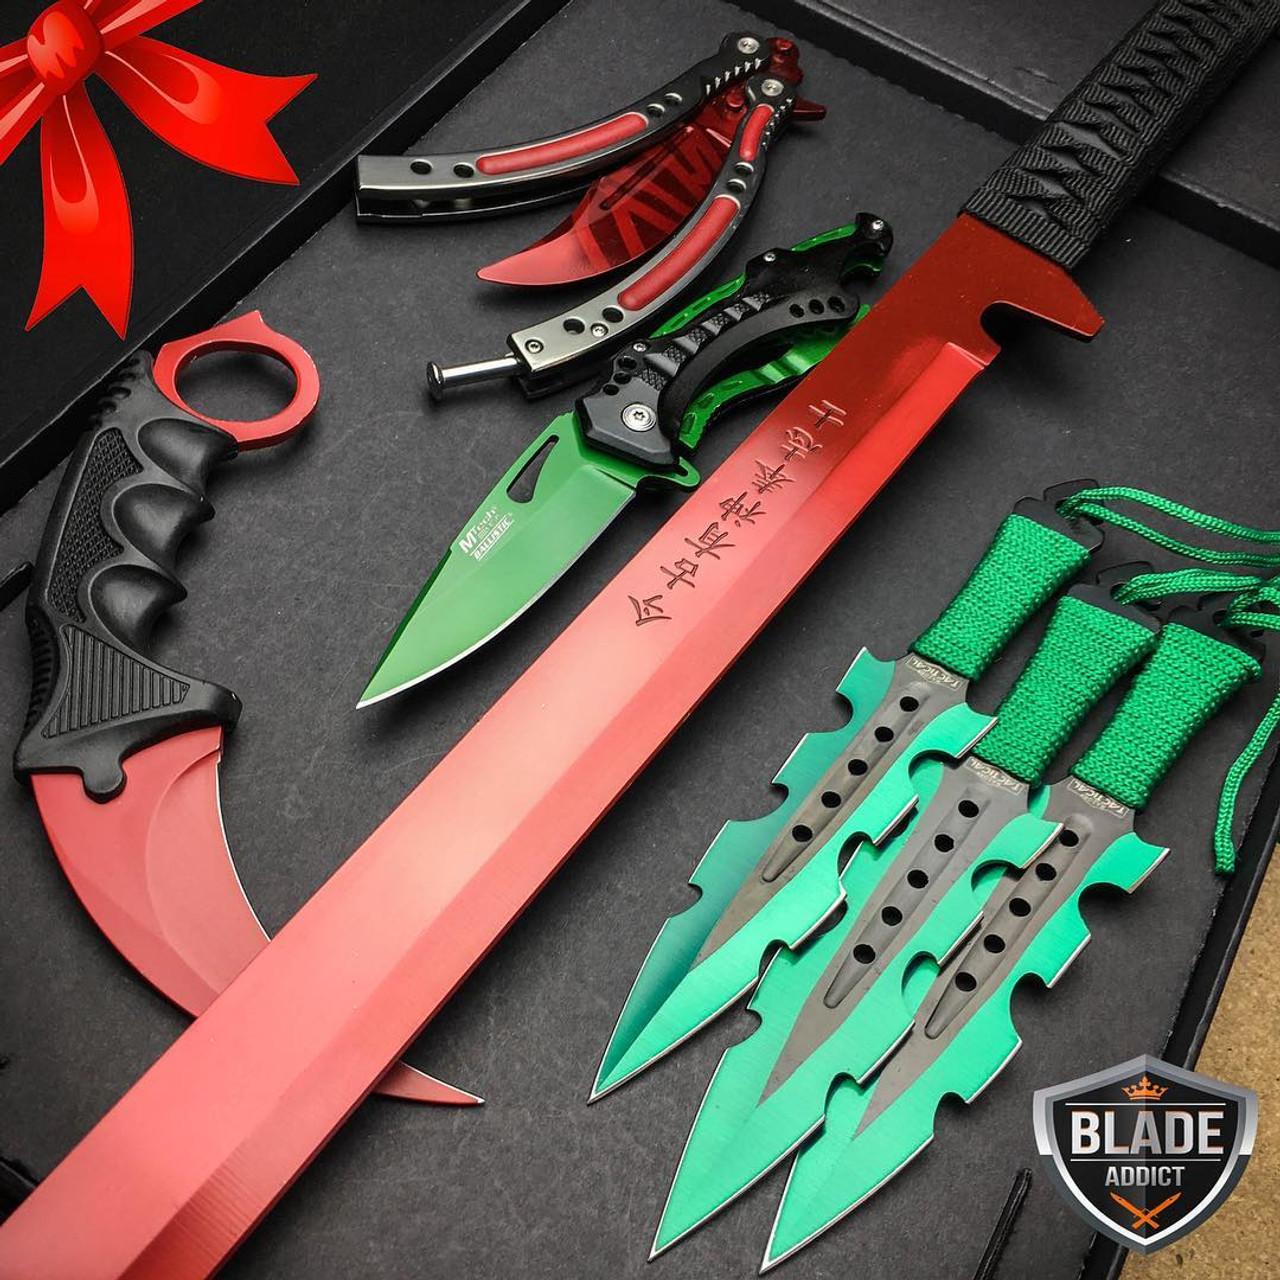 Special Edition Christmas Set 5 Pc Elite Knife Set